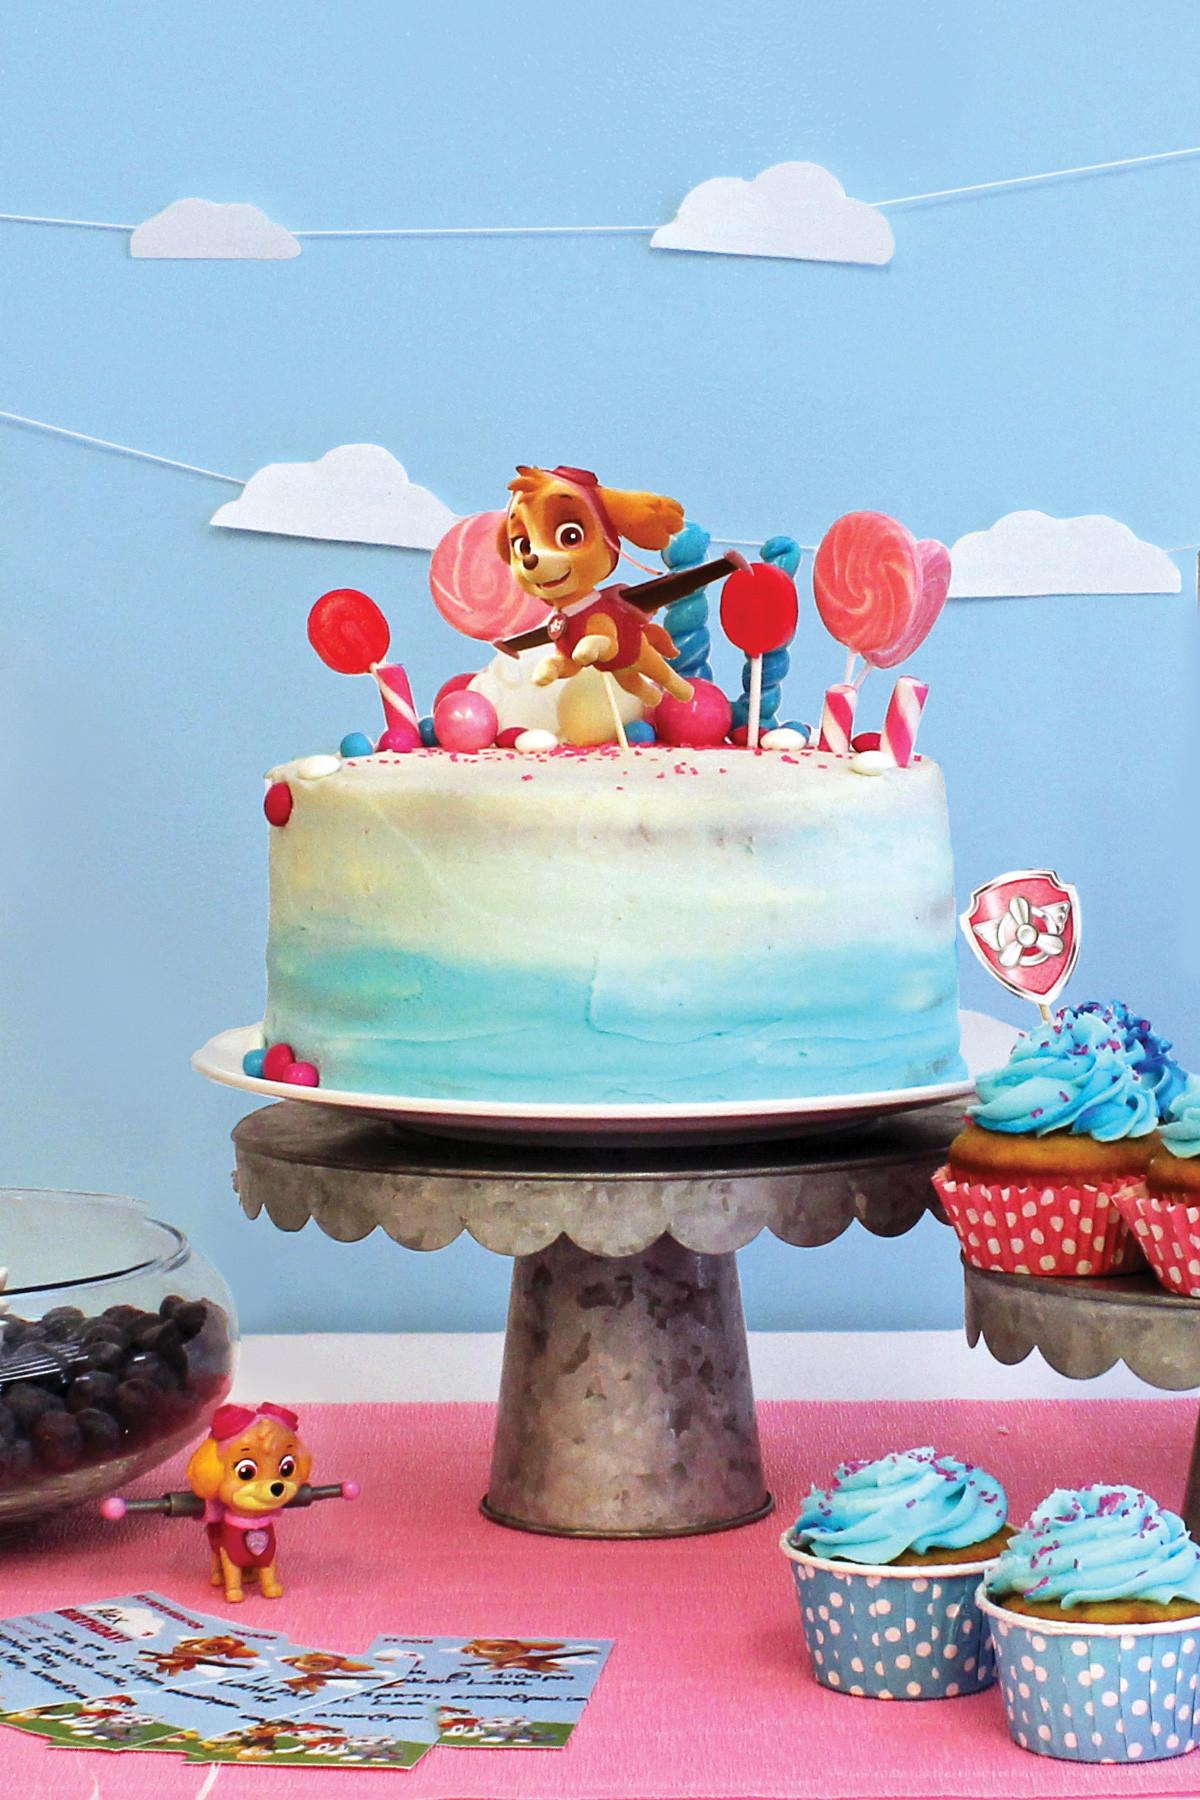 Best ideas about Skye Paw Patrol Birthday Decorations . Save or Pin Throw a Skye Birthday Celebration Now.